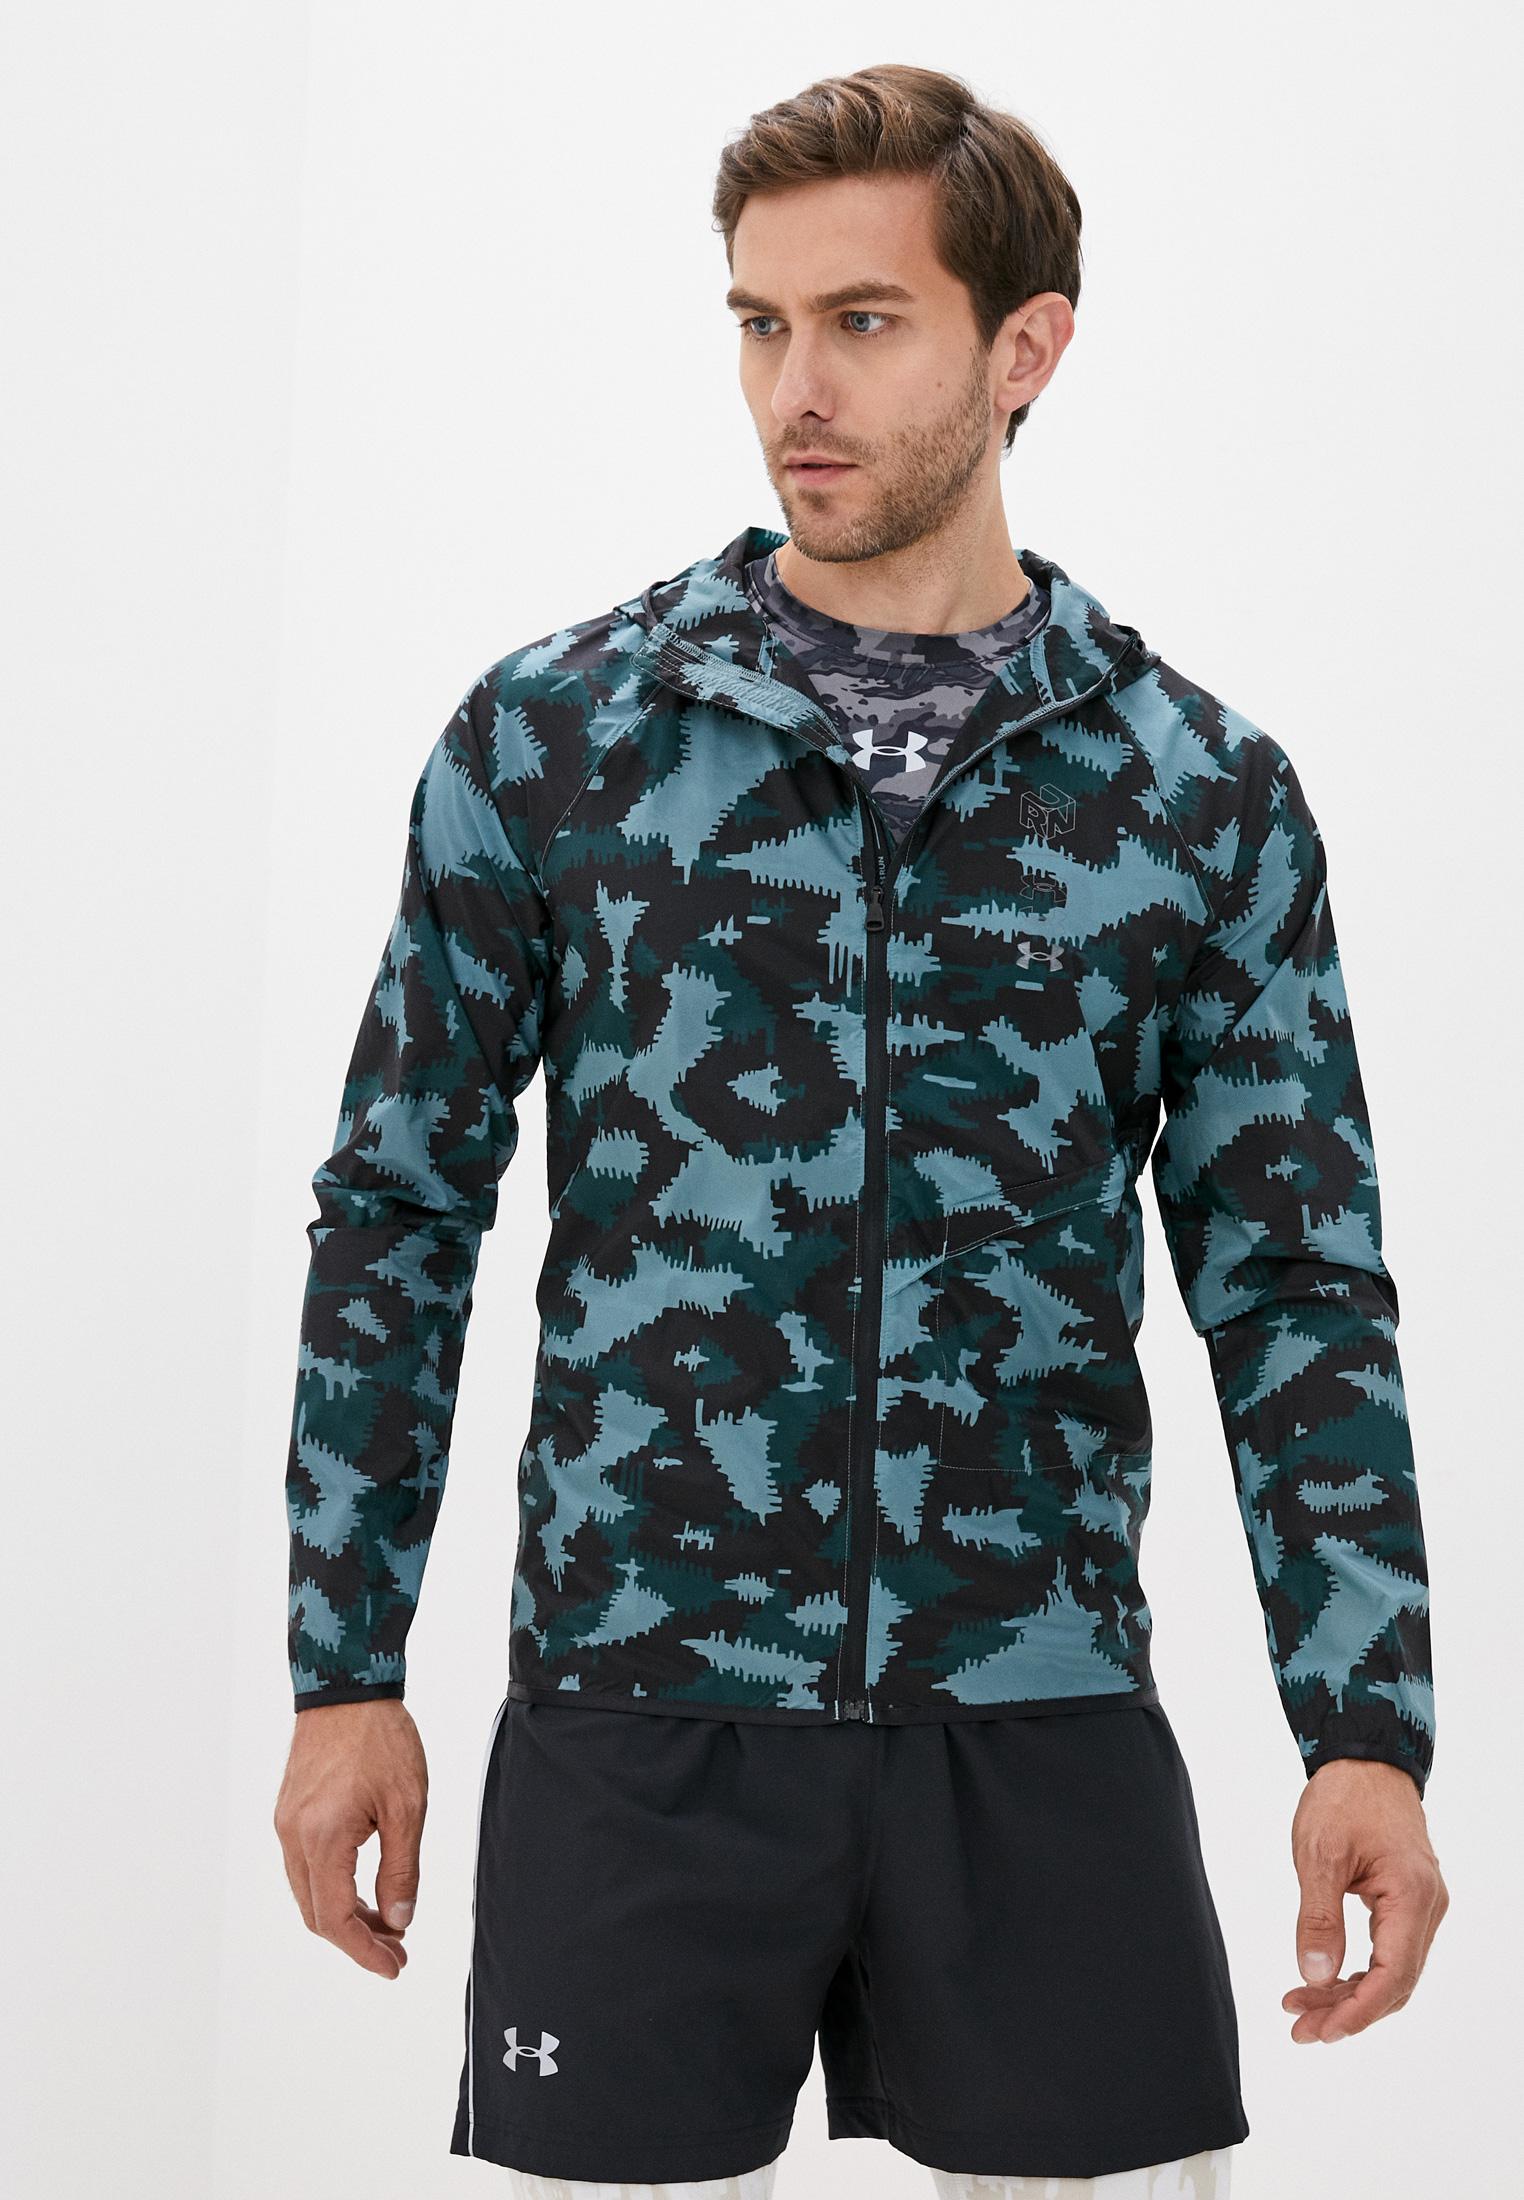 Мужская верхняя одежда Under Armour 1356161